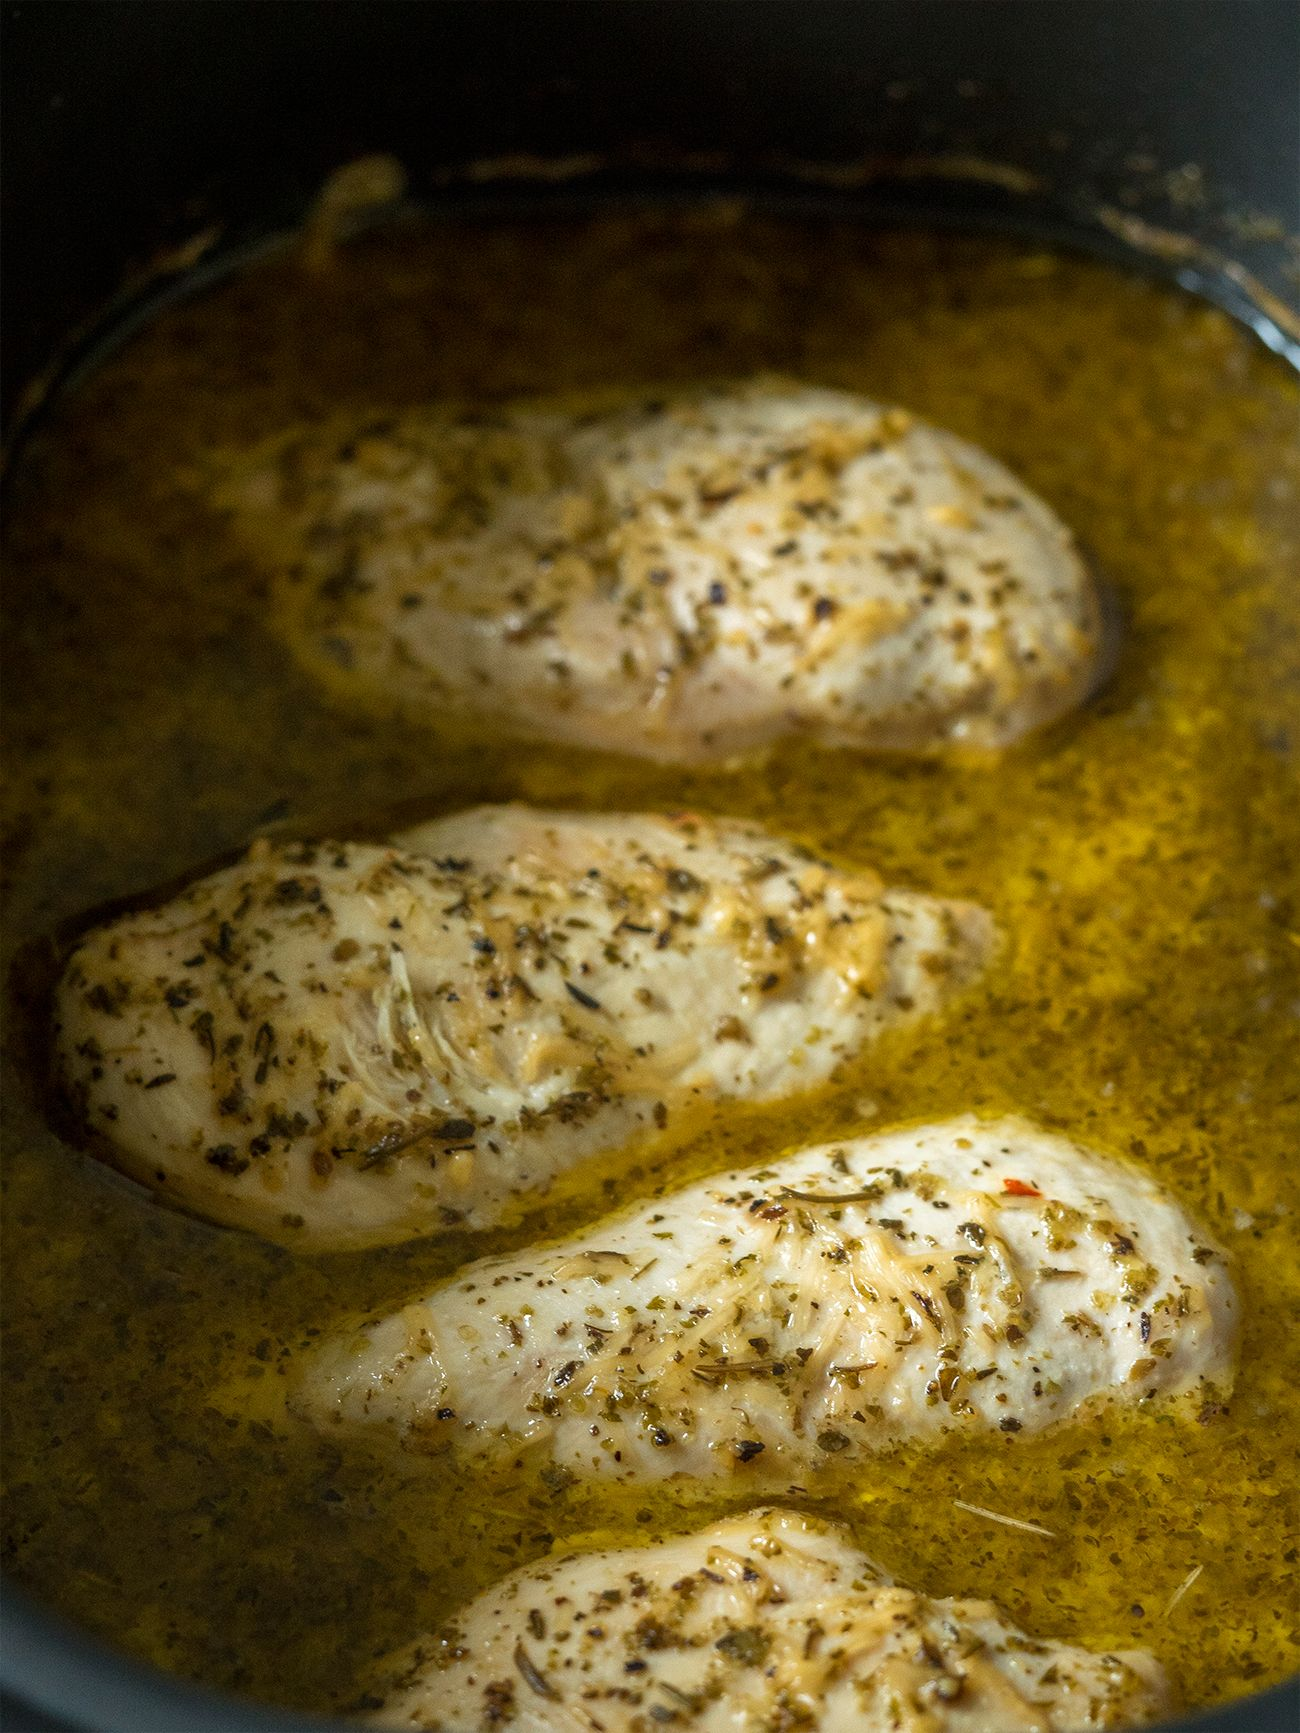 Slow Cooker Olive Garden Chicken | Food and drink | Pinterest ...